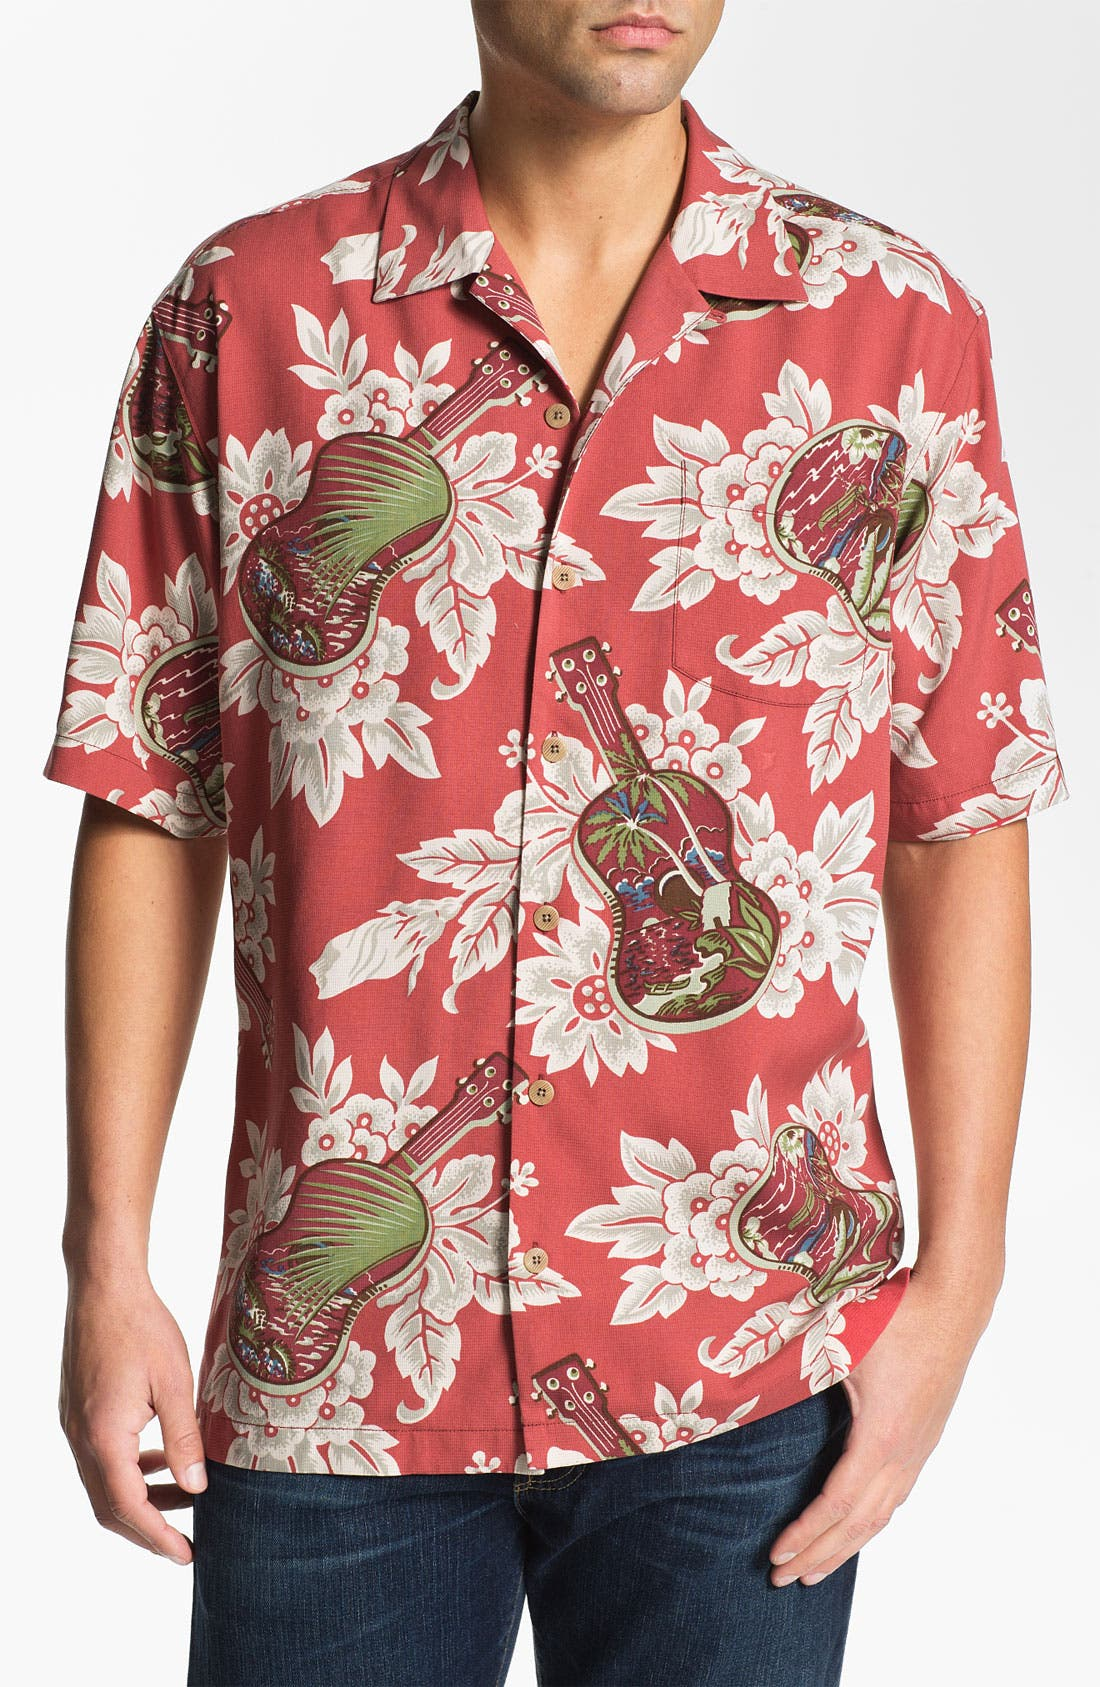 Main Image - Tommy Bahama 'Island Jams' Silk Campshirt